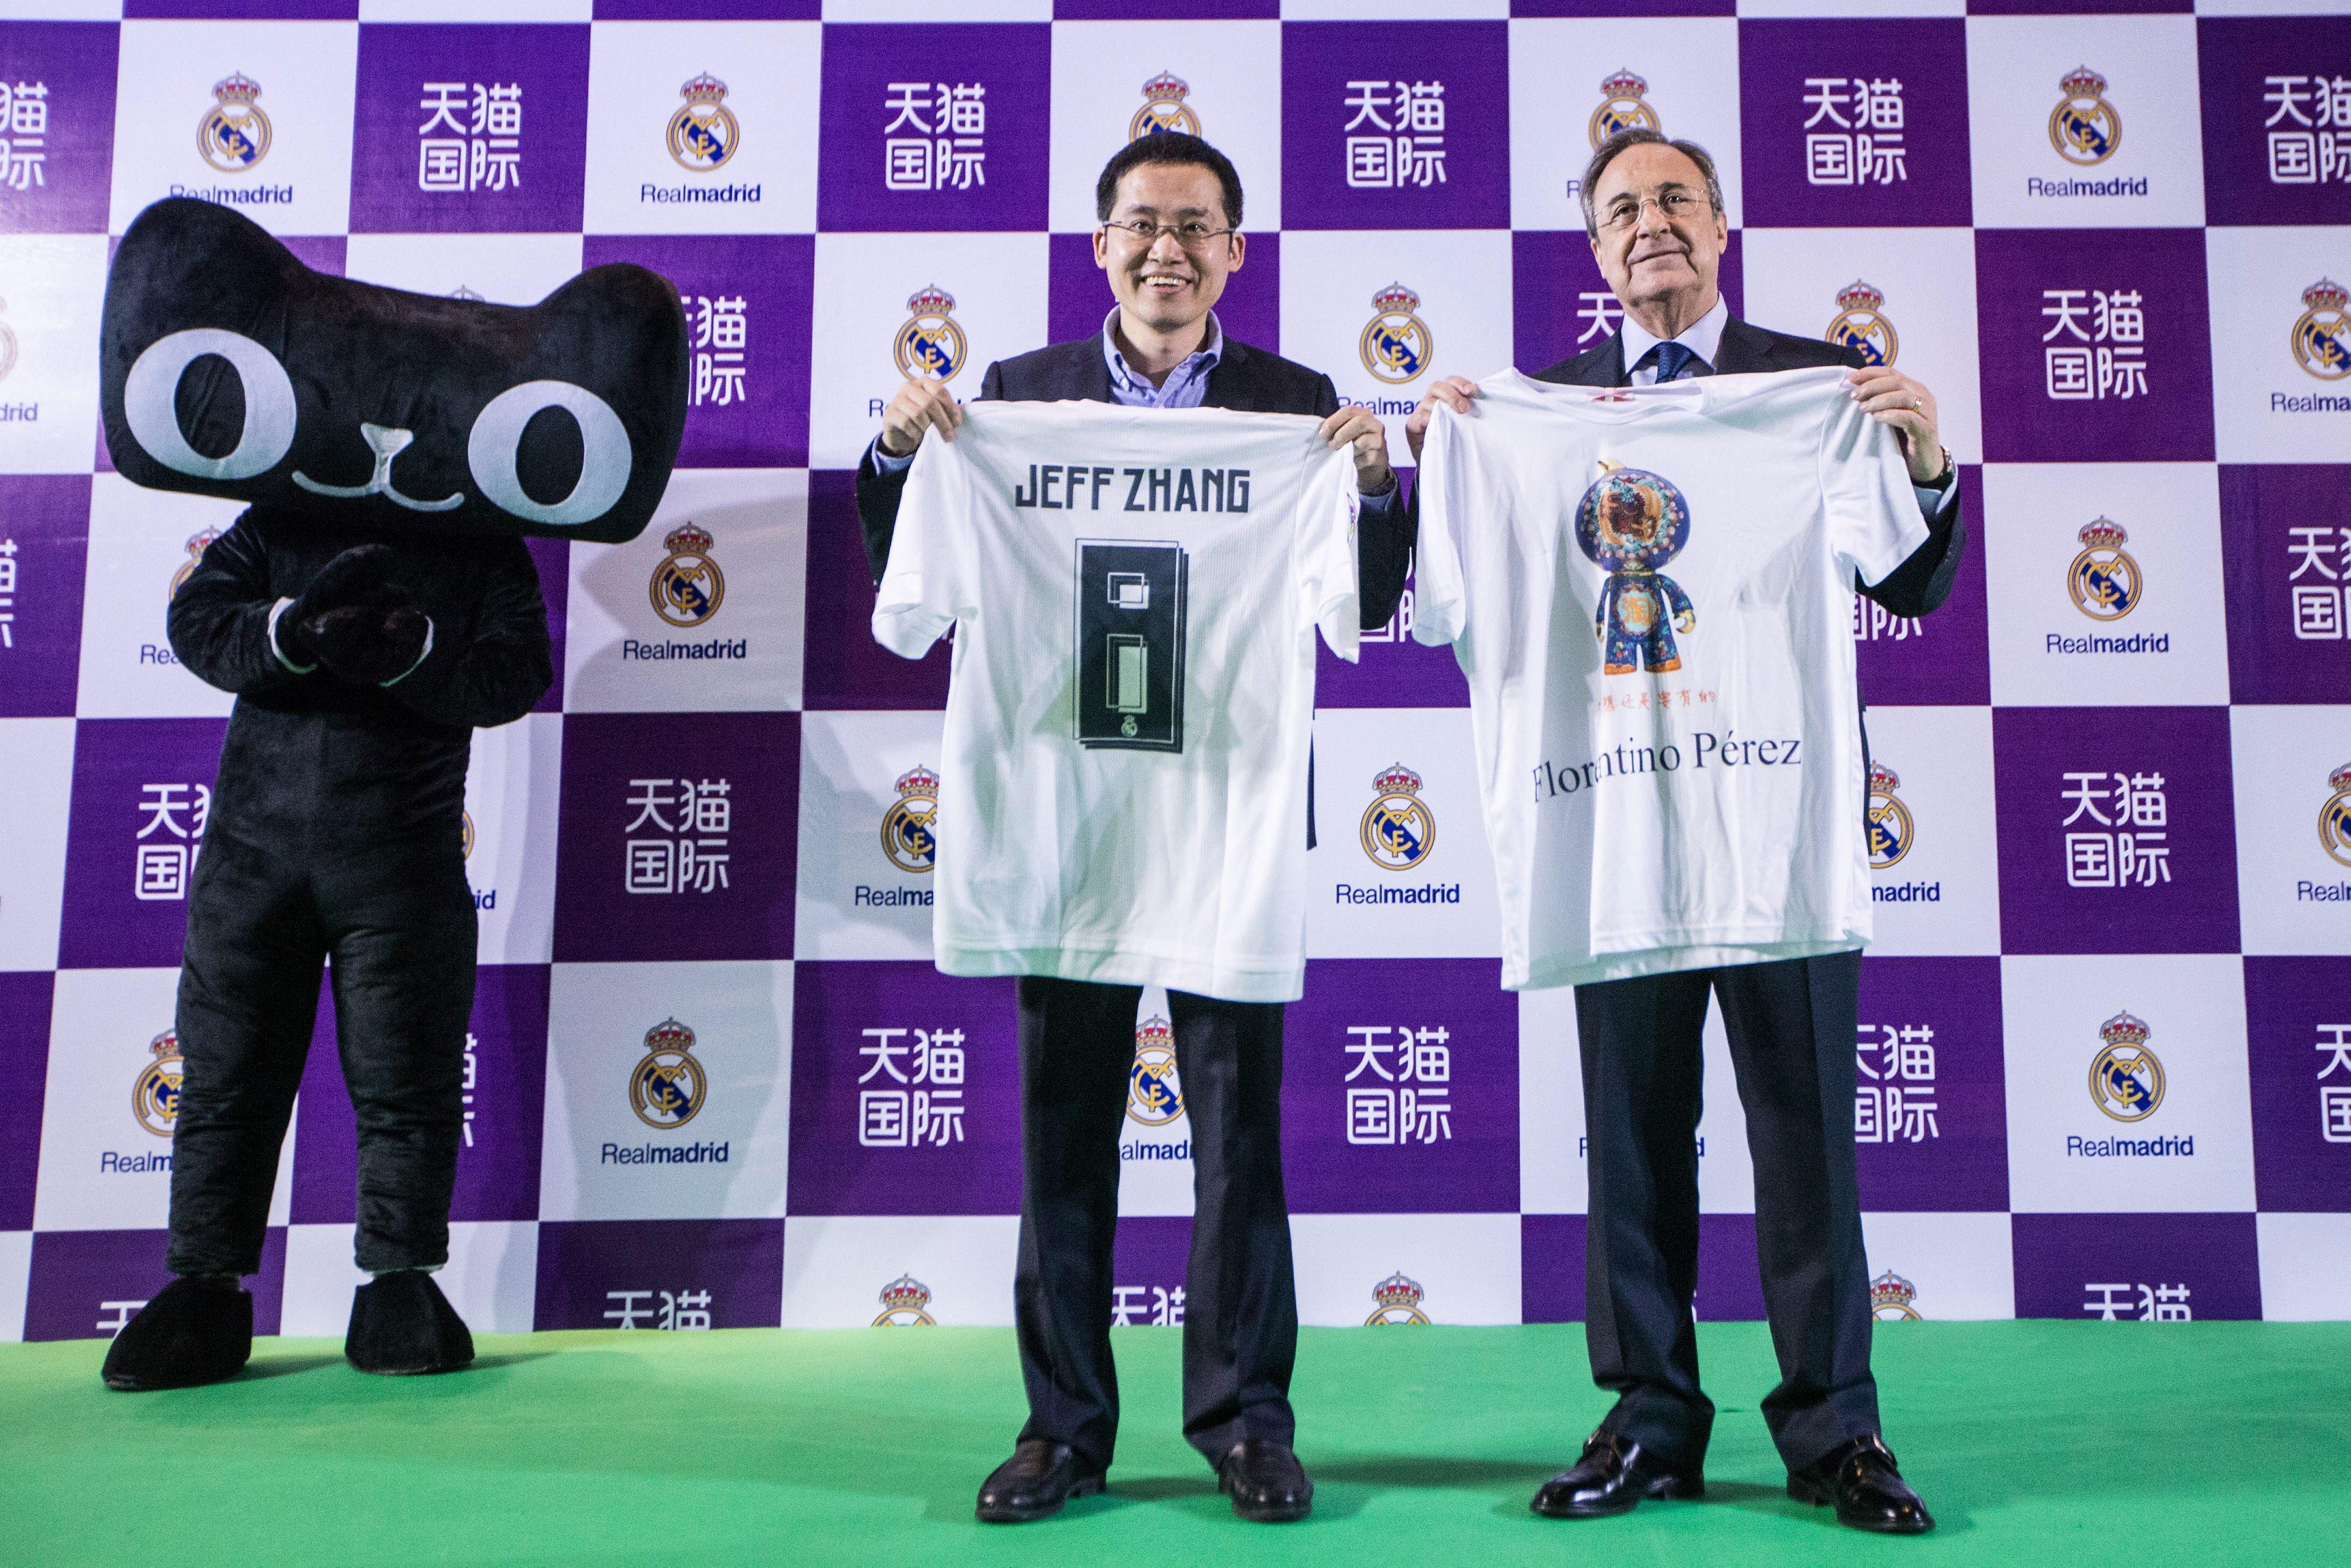 https://www.scmp.com/sites/default/files/2015/07/30/china_soccer_real_madrid_fuz02_51642381.jpg